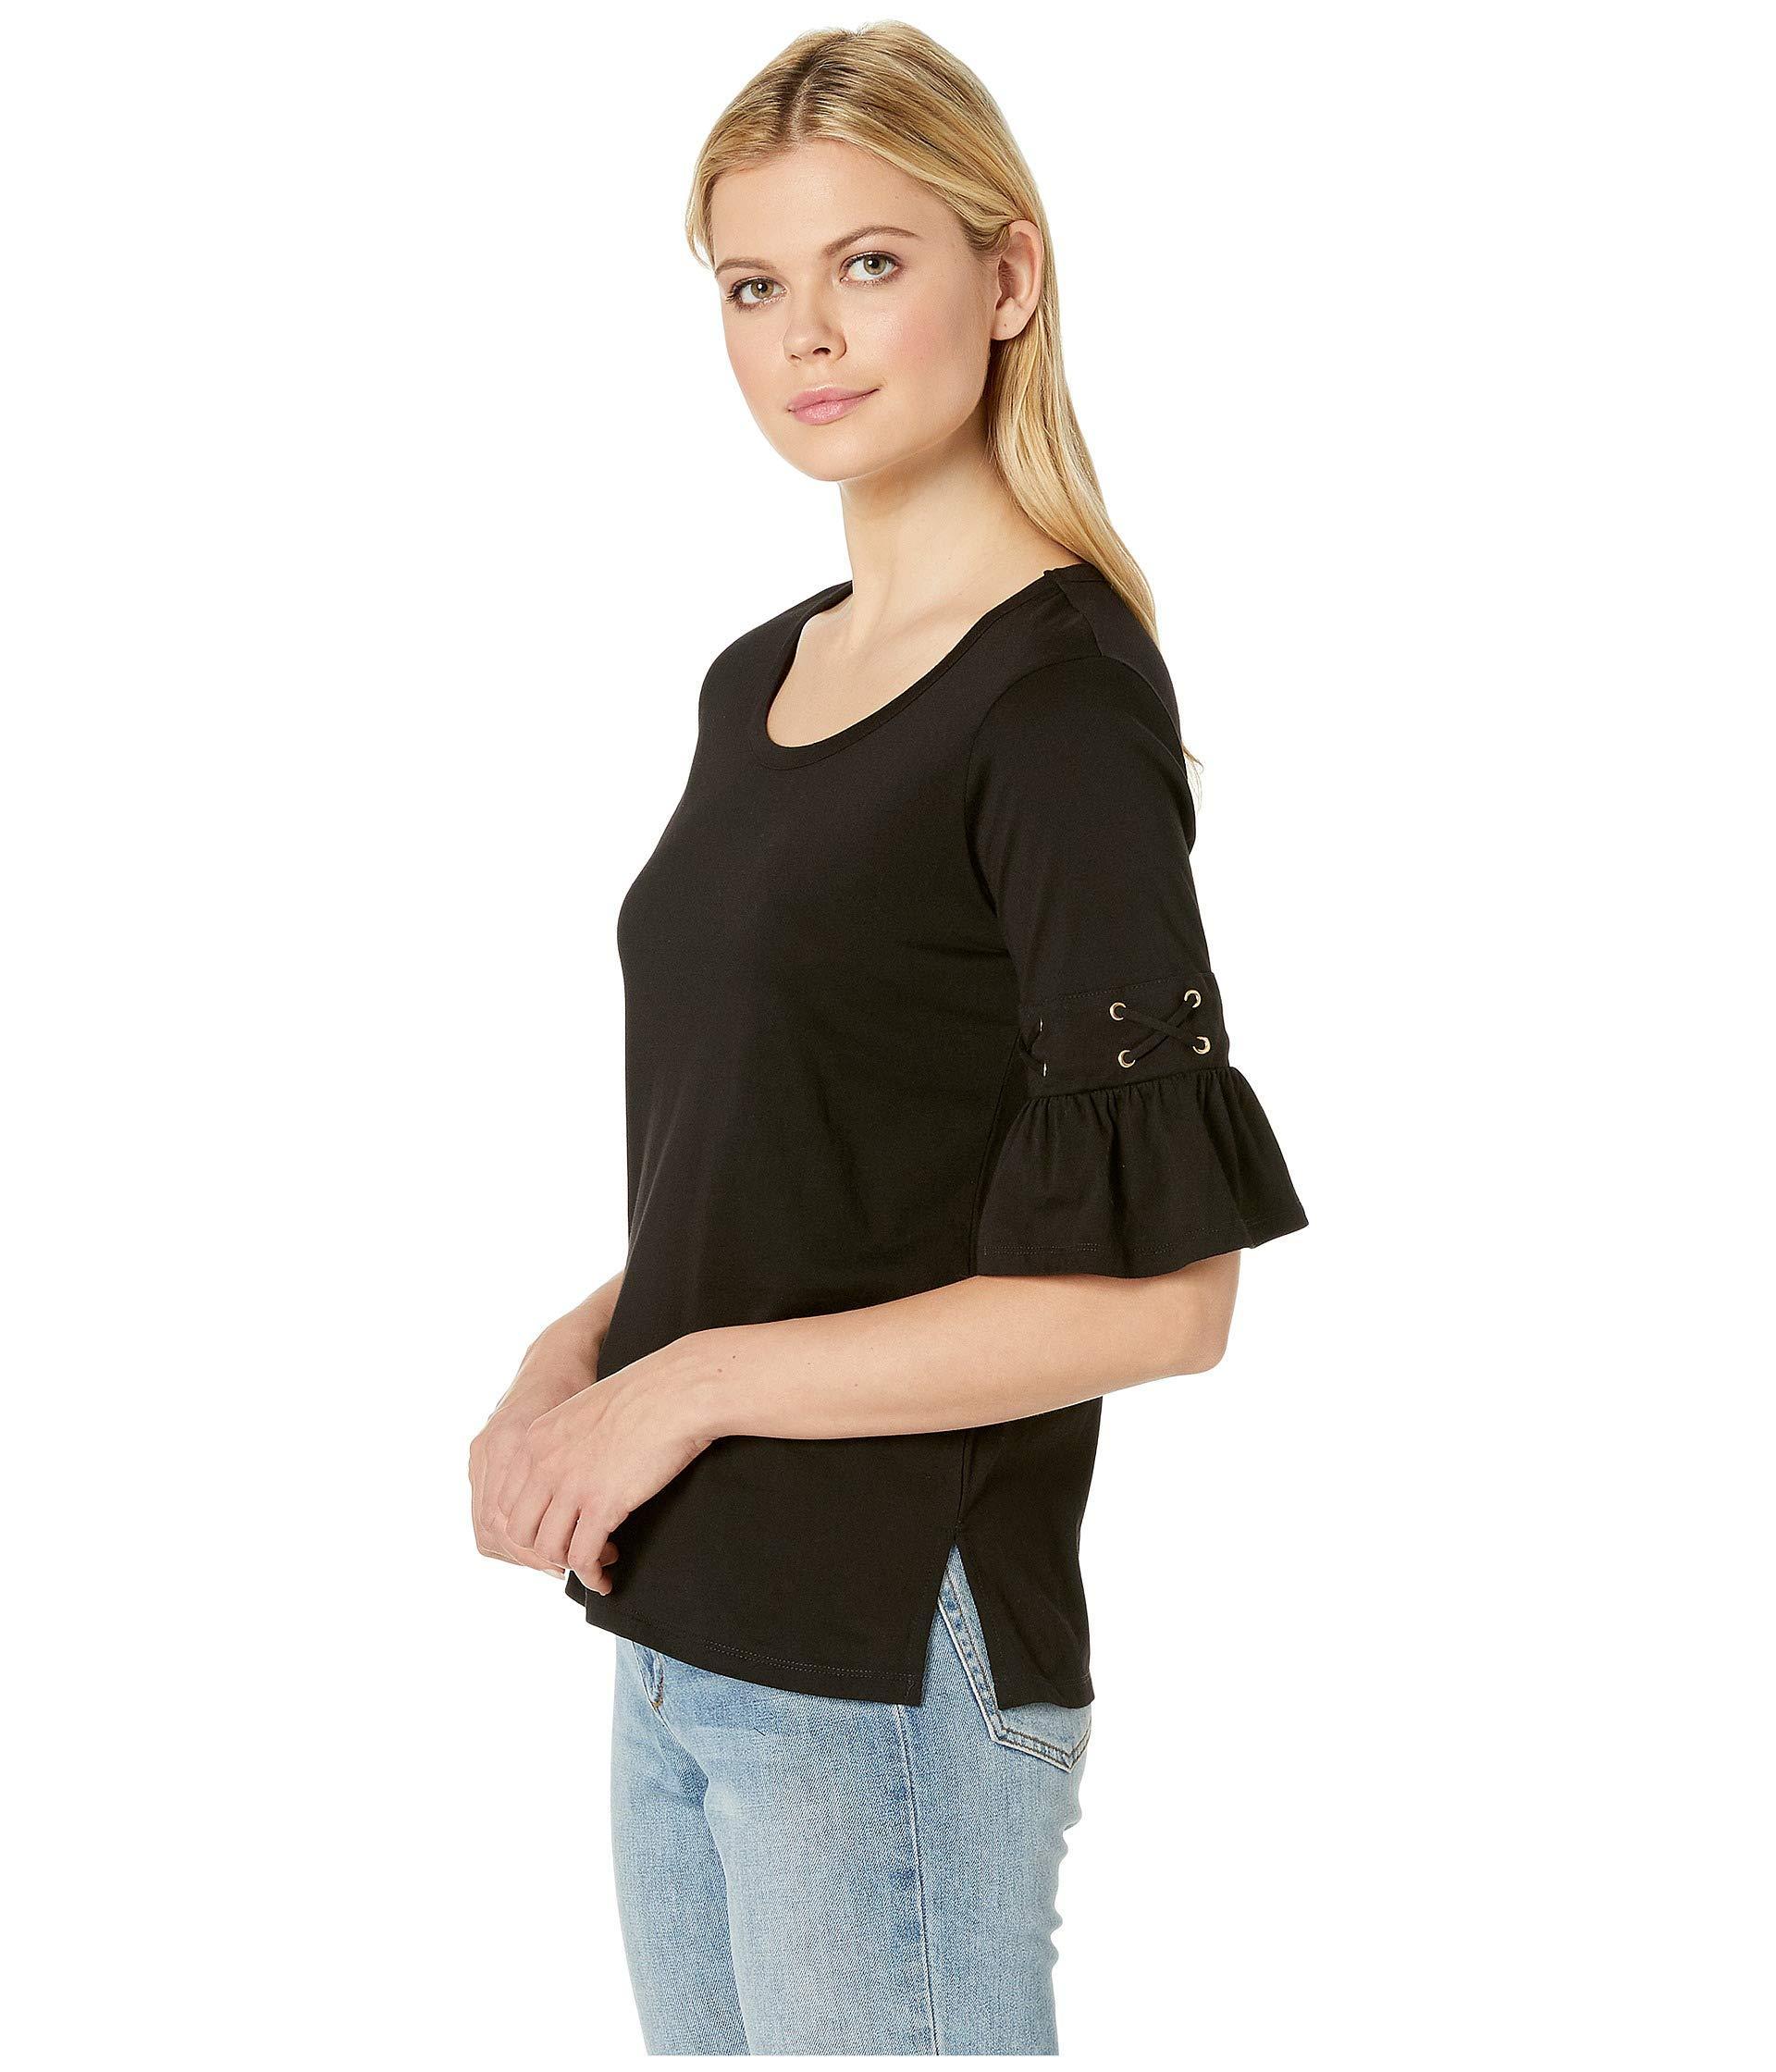 0f2d80230de11 Lyst - MICHAEL Michael Kors Laced Sleeve Flare Tee (black) Women s T Shirt  in Black